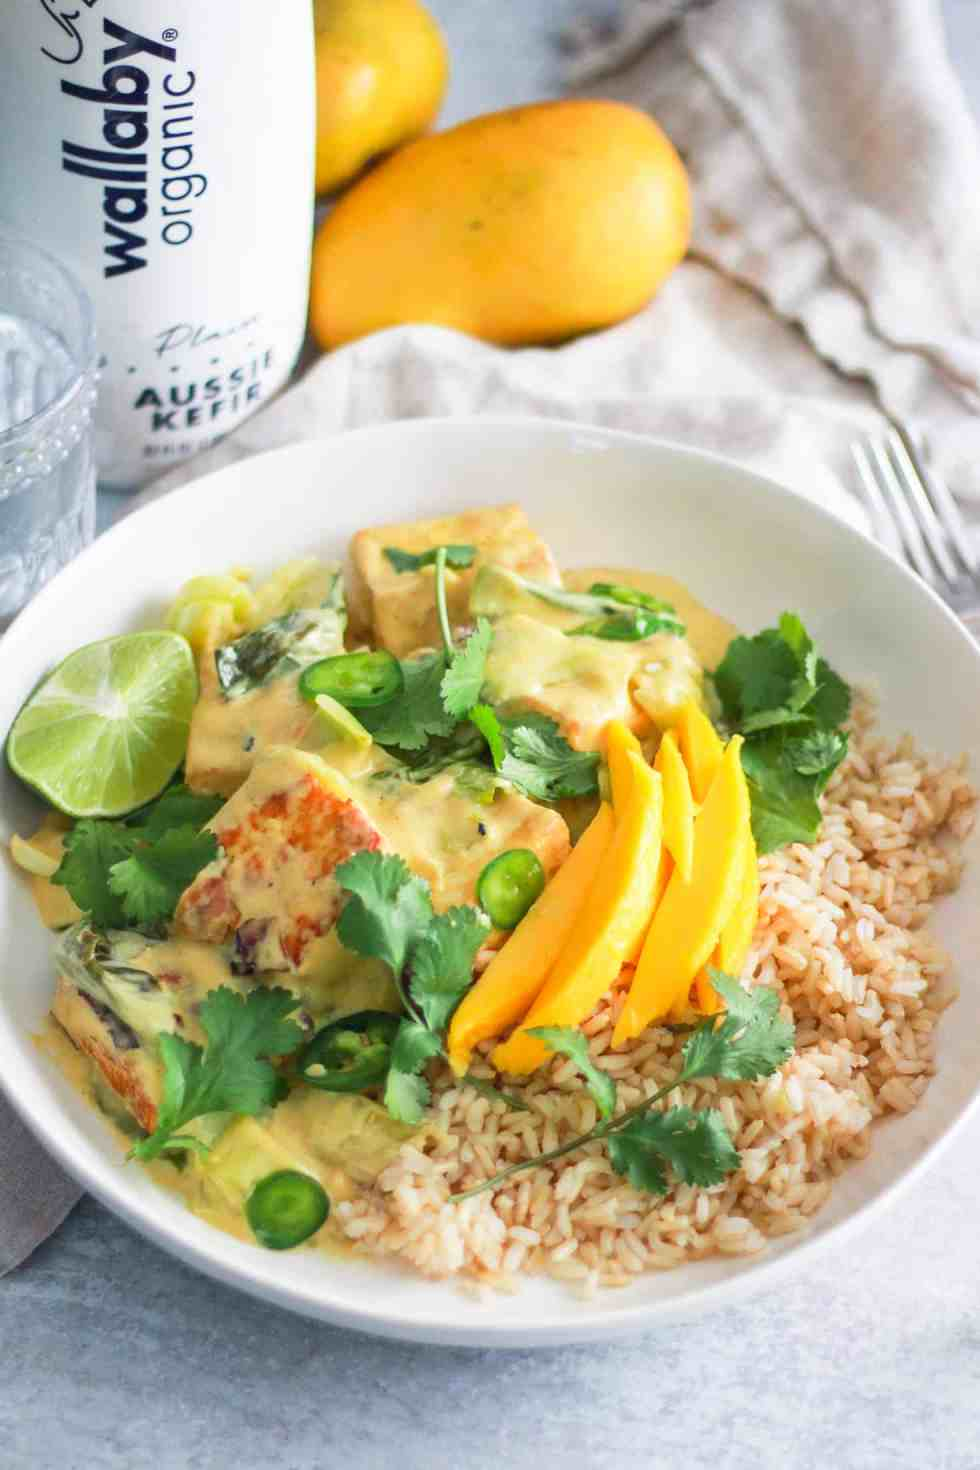 Mango tofu bowl with Wallaby Organic Kefir behind it.